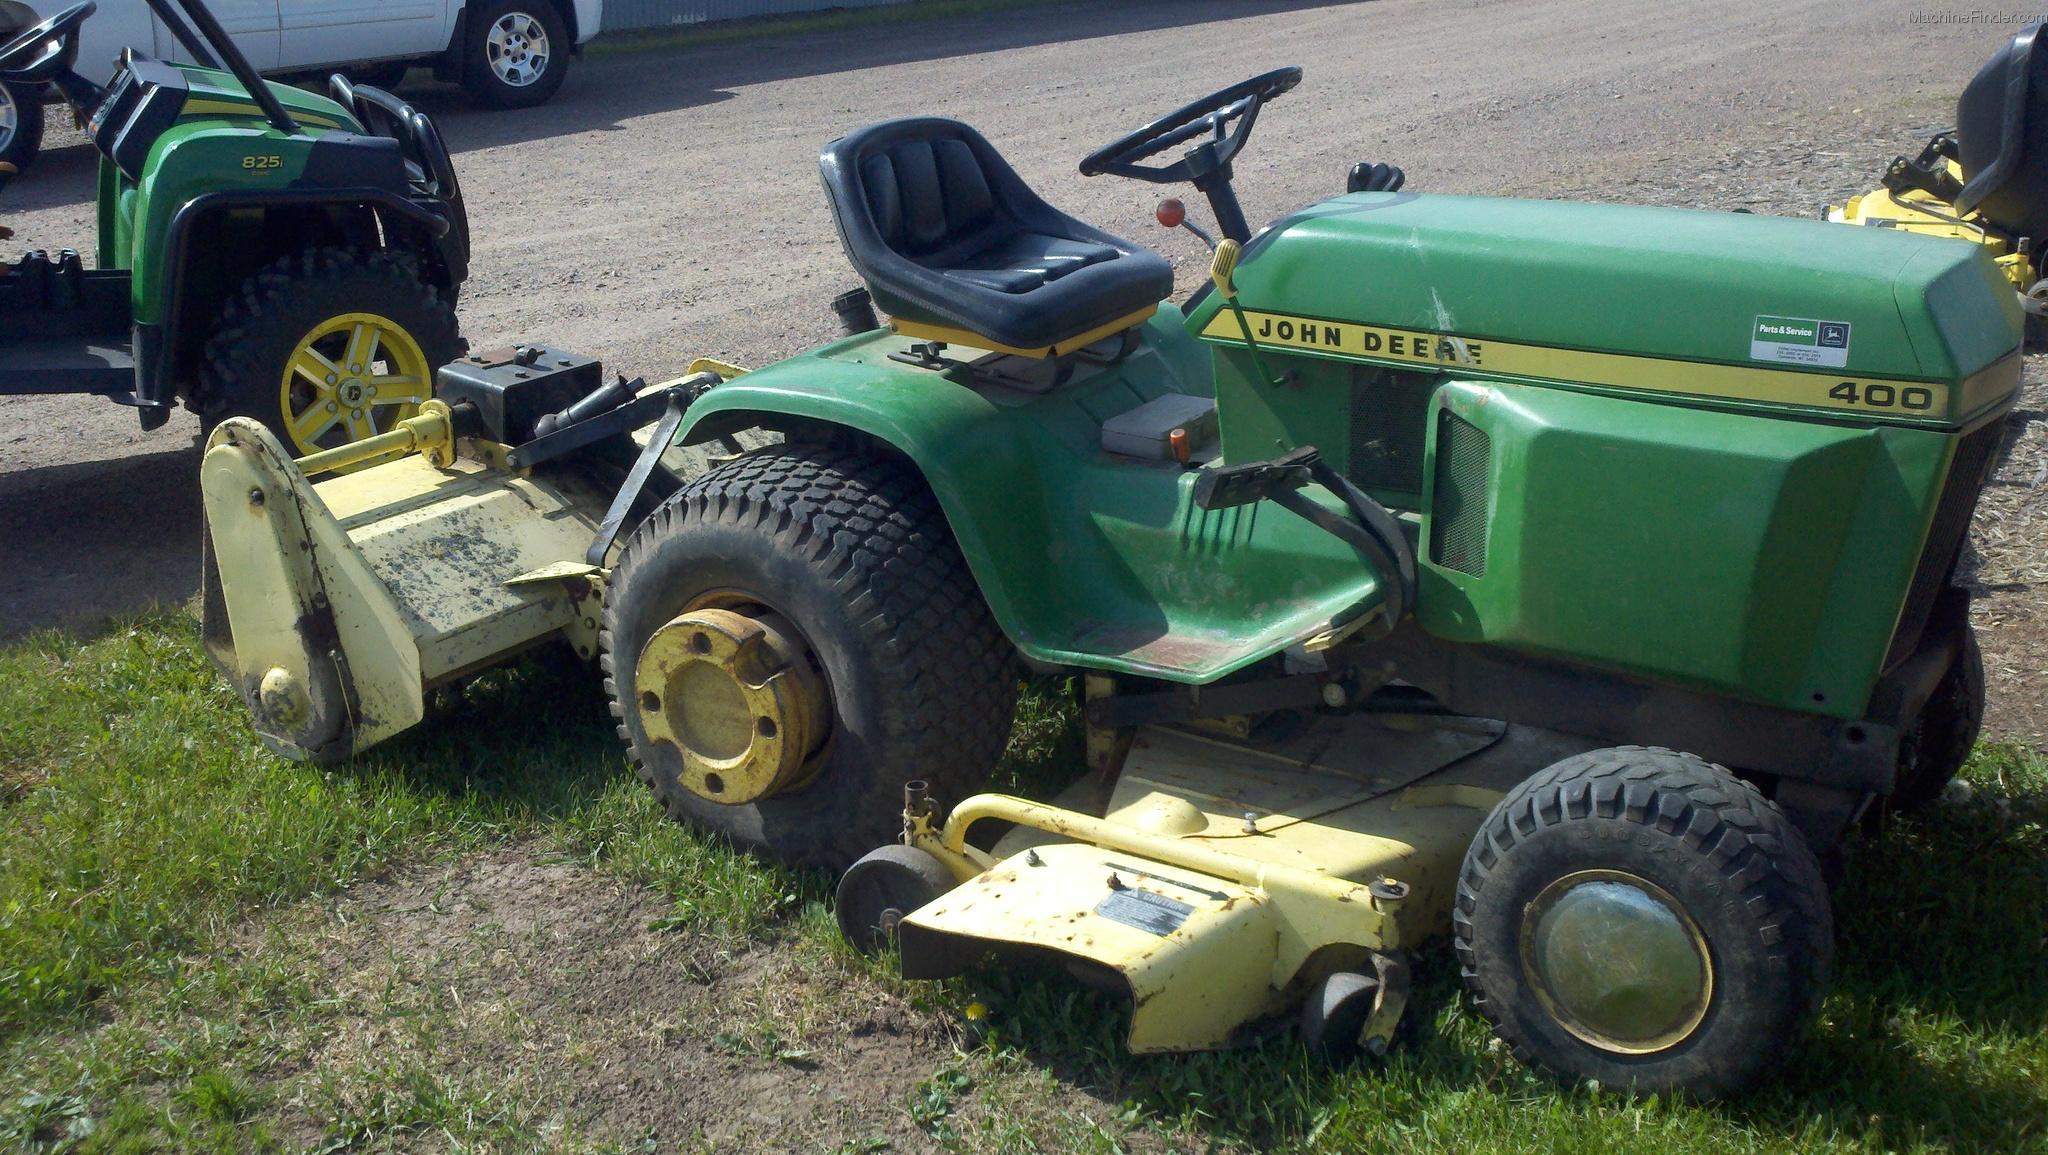 deck equipment parts garden mower bingimages agricultural john used tractor deere farm machinefinder